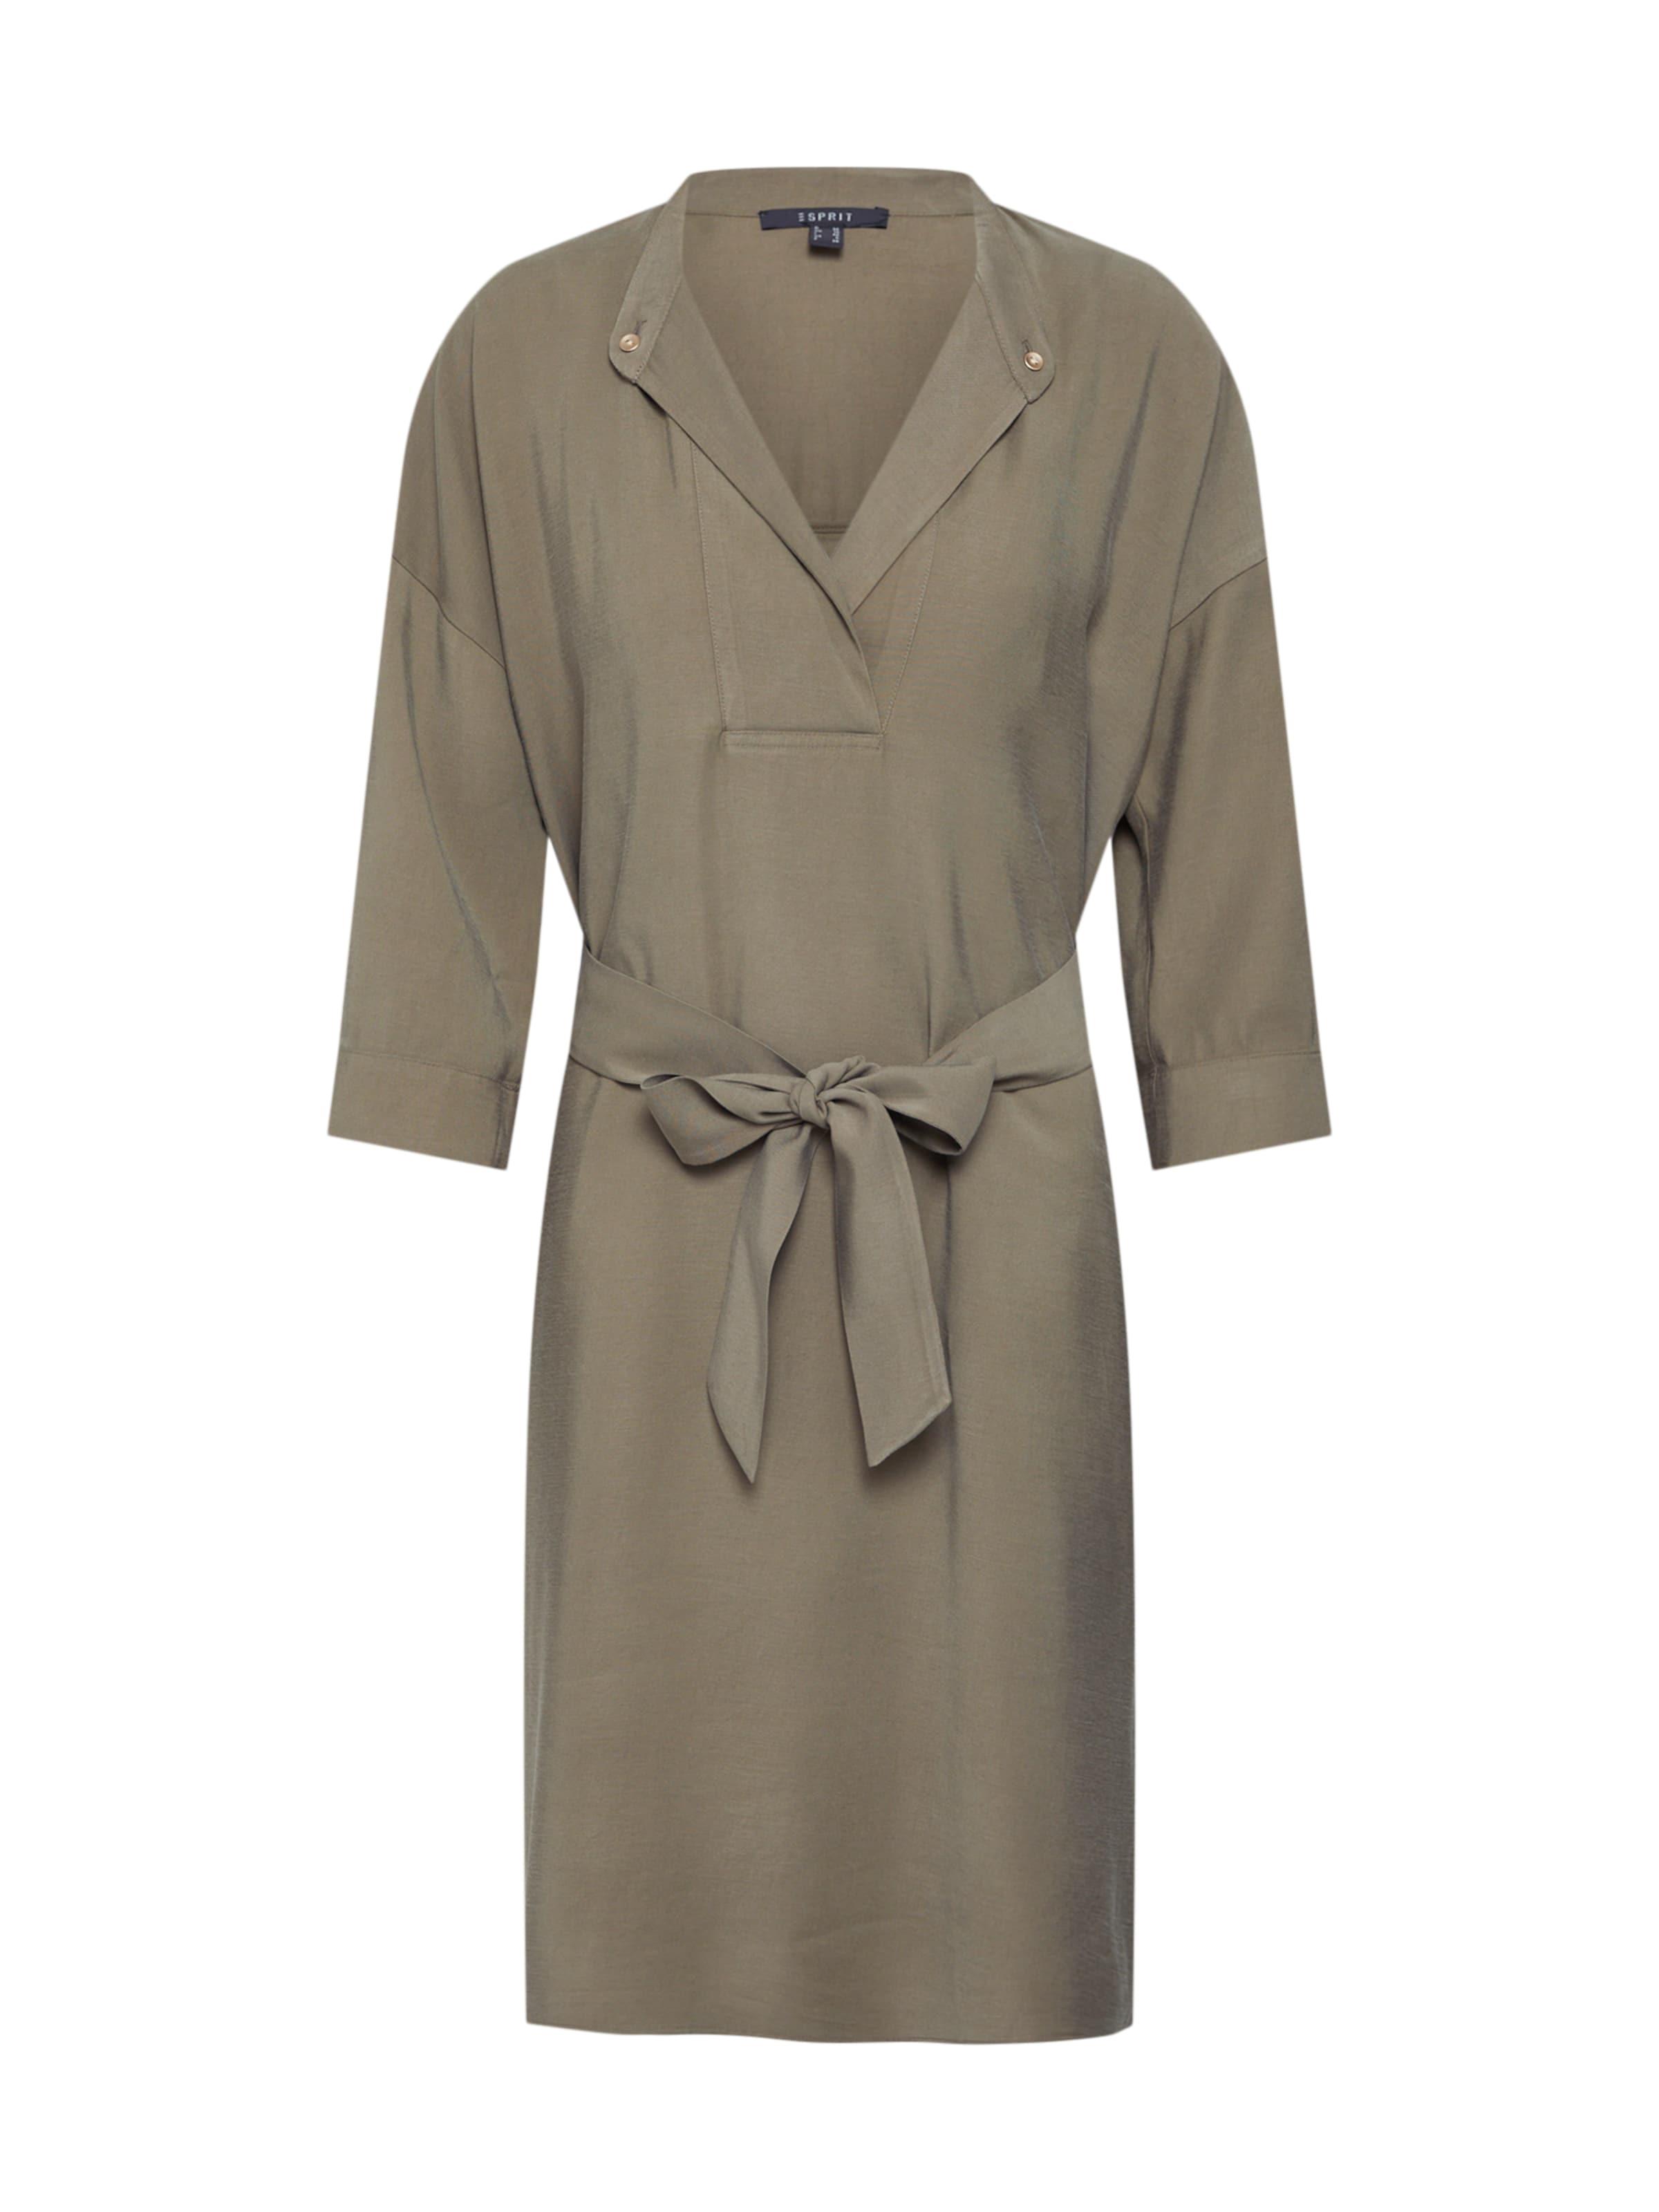 DamenKleider In Rayon Collection Khaki 'fluid Esprit Mix' 5q3ALc4jSR